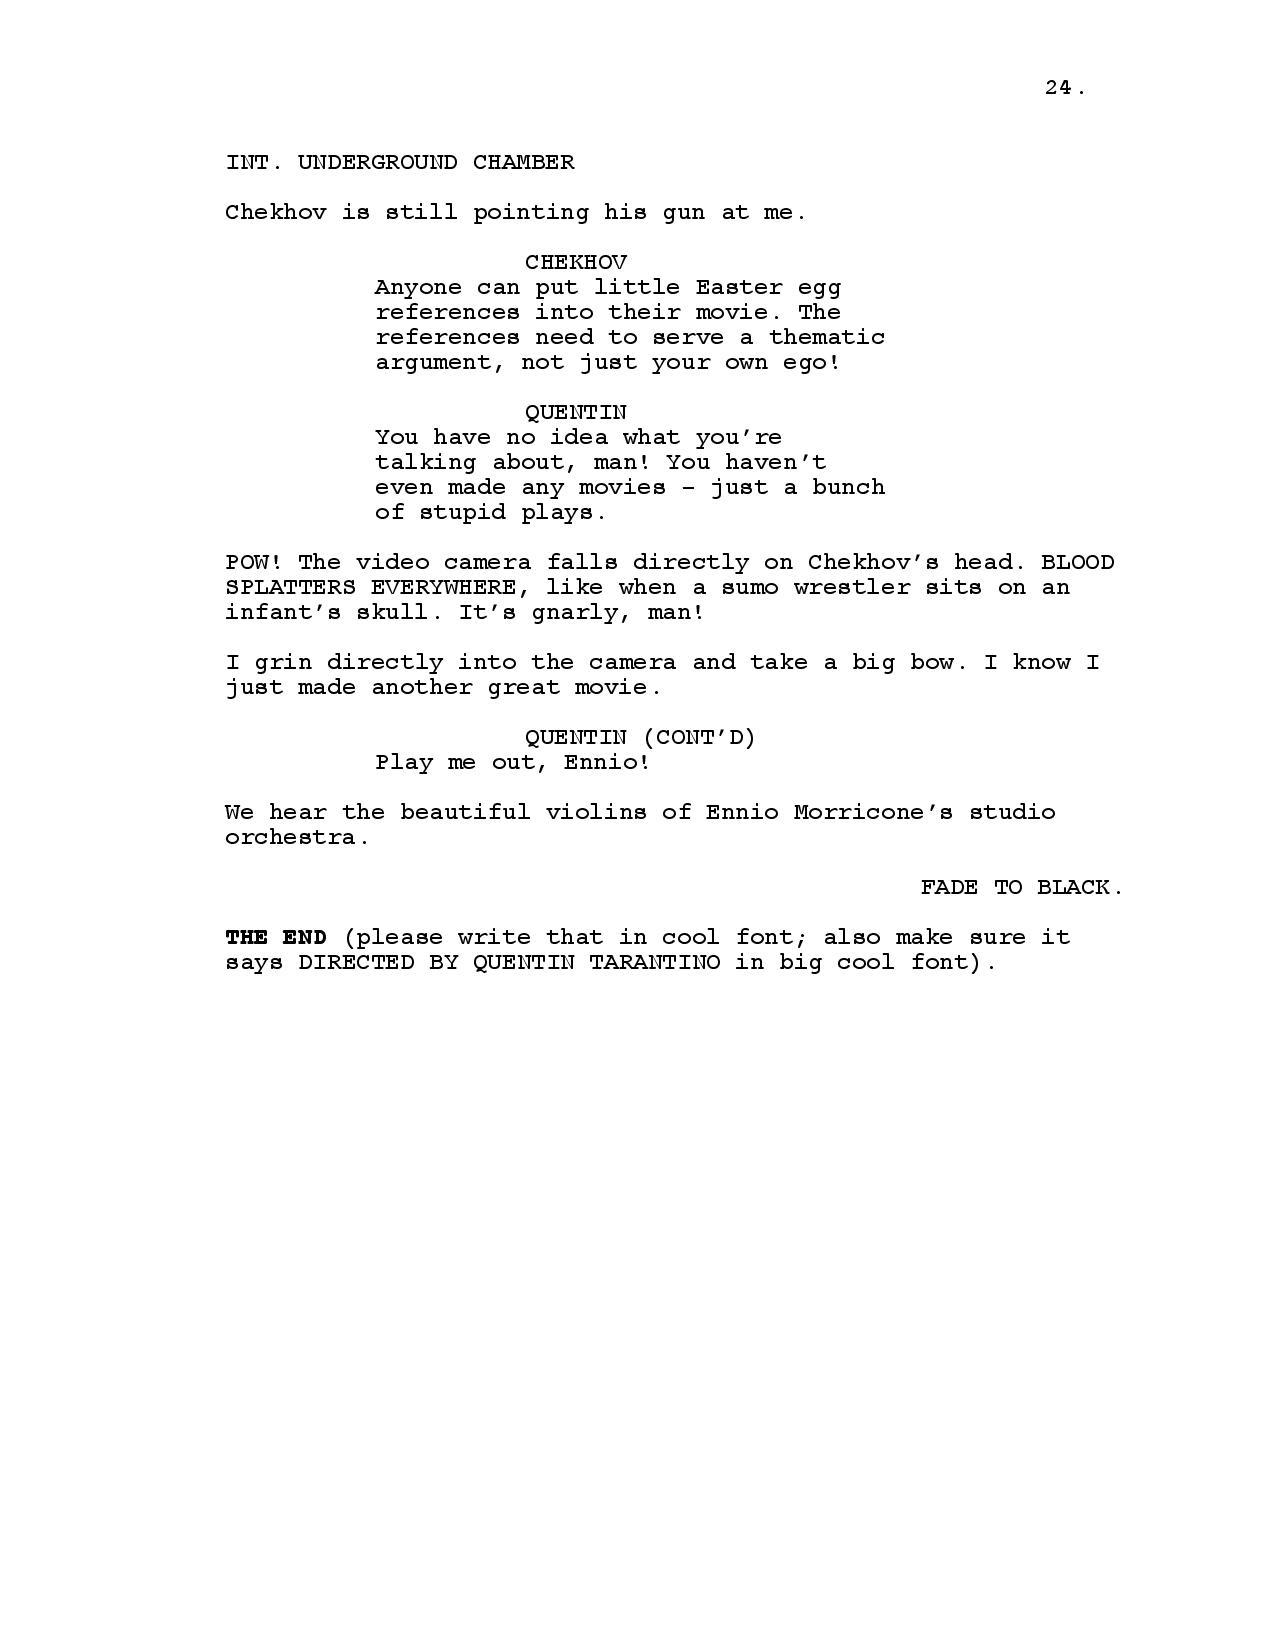 New Tarantino Screenplay-1-page-025